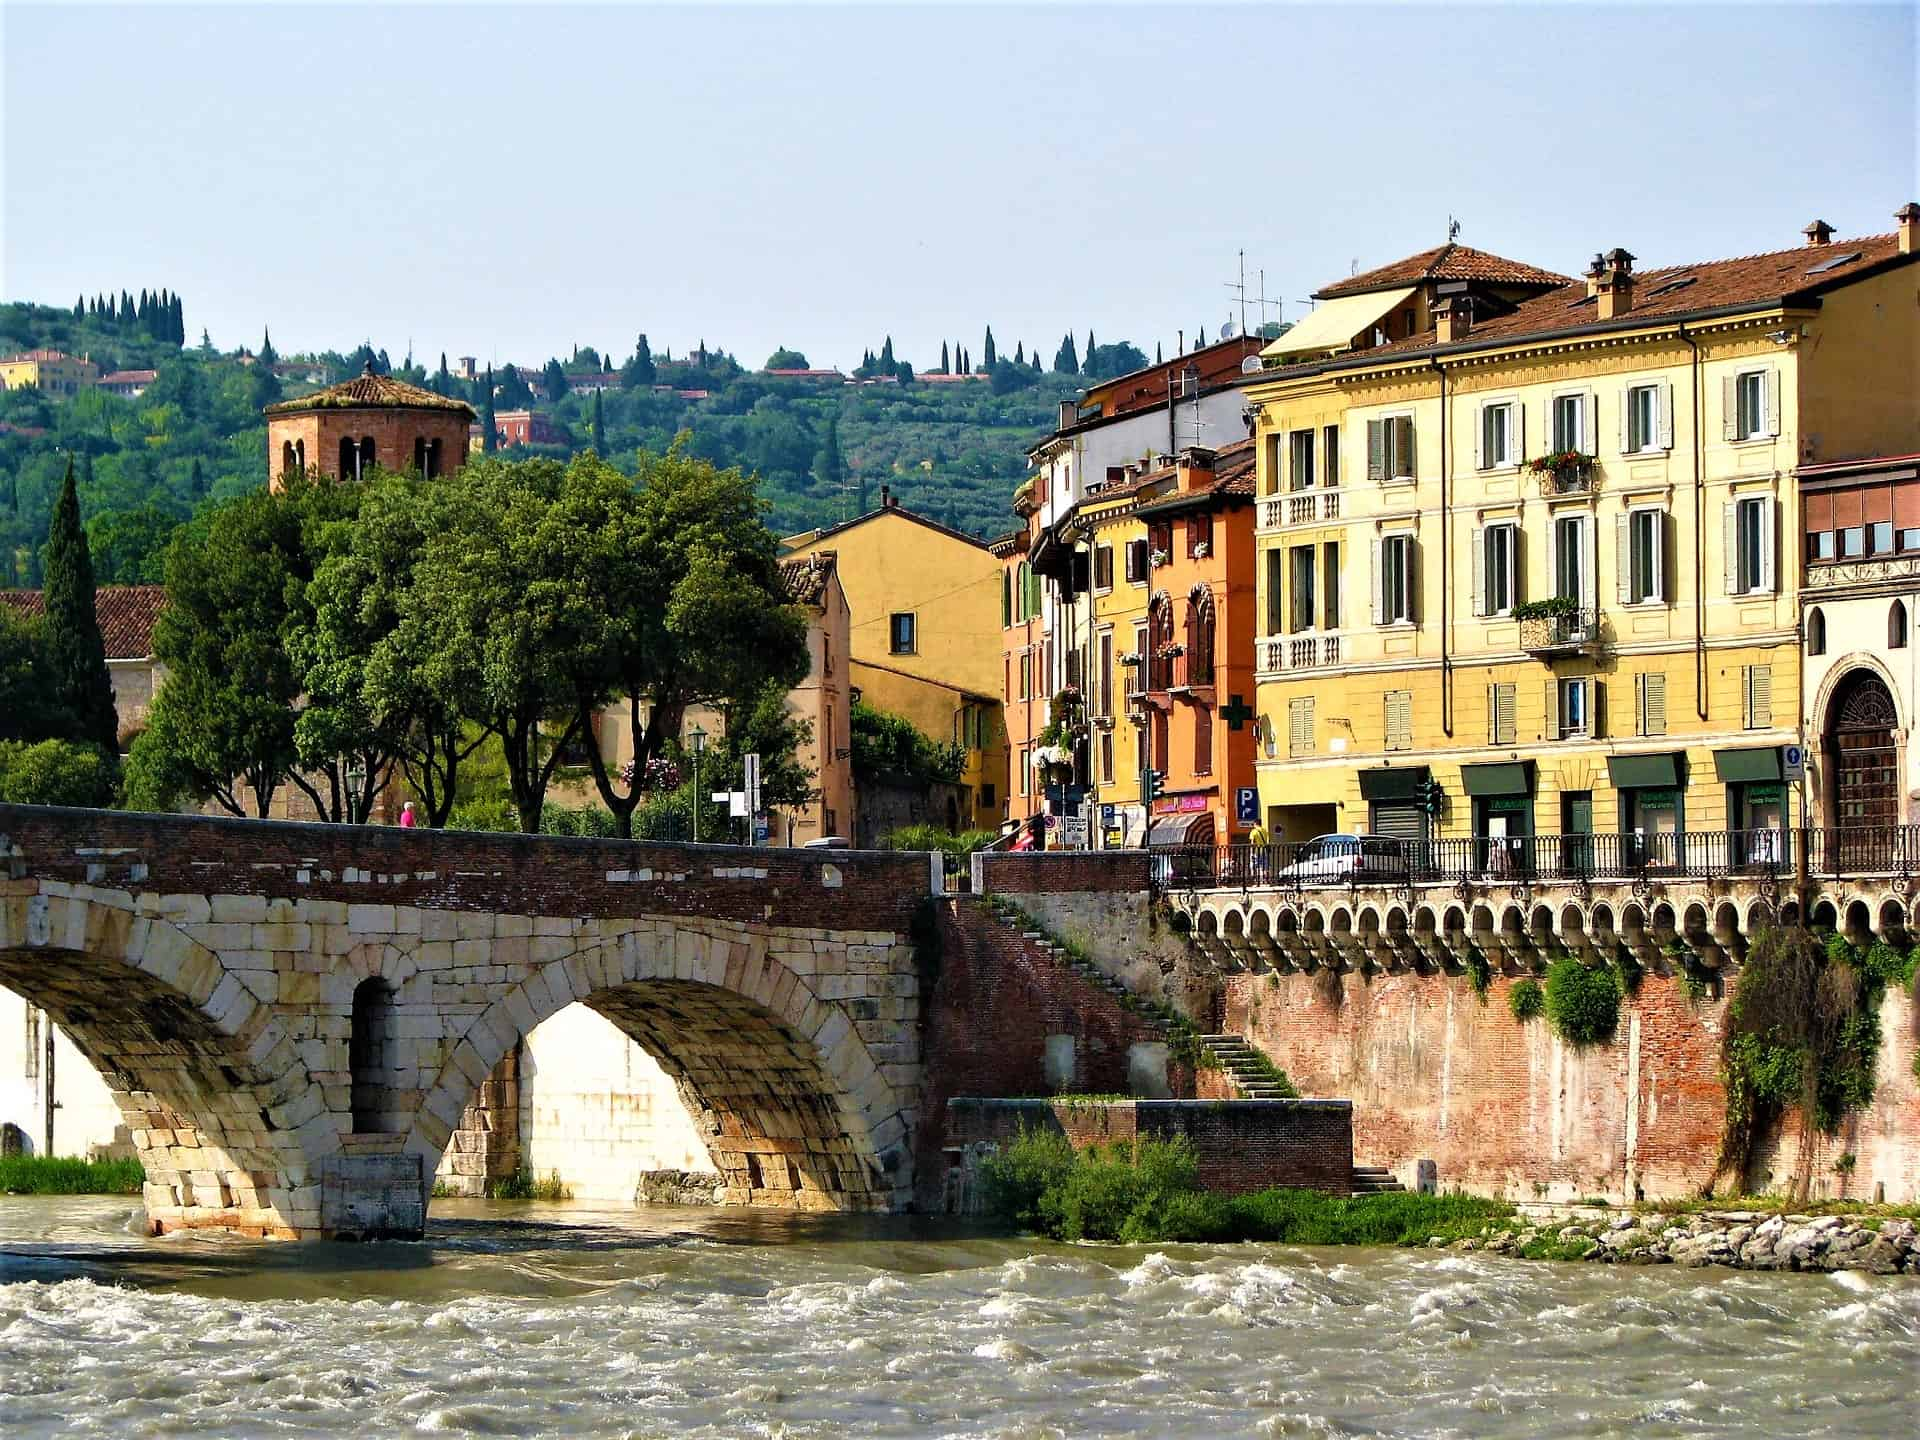 Verona Most Beautiful Cities in Europe